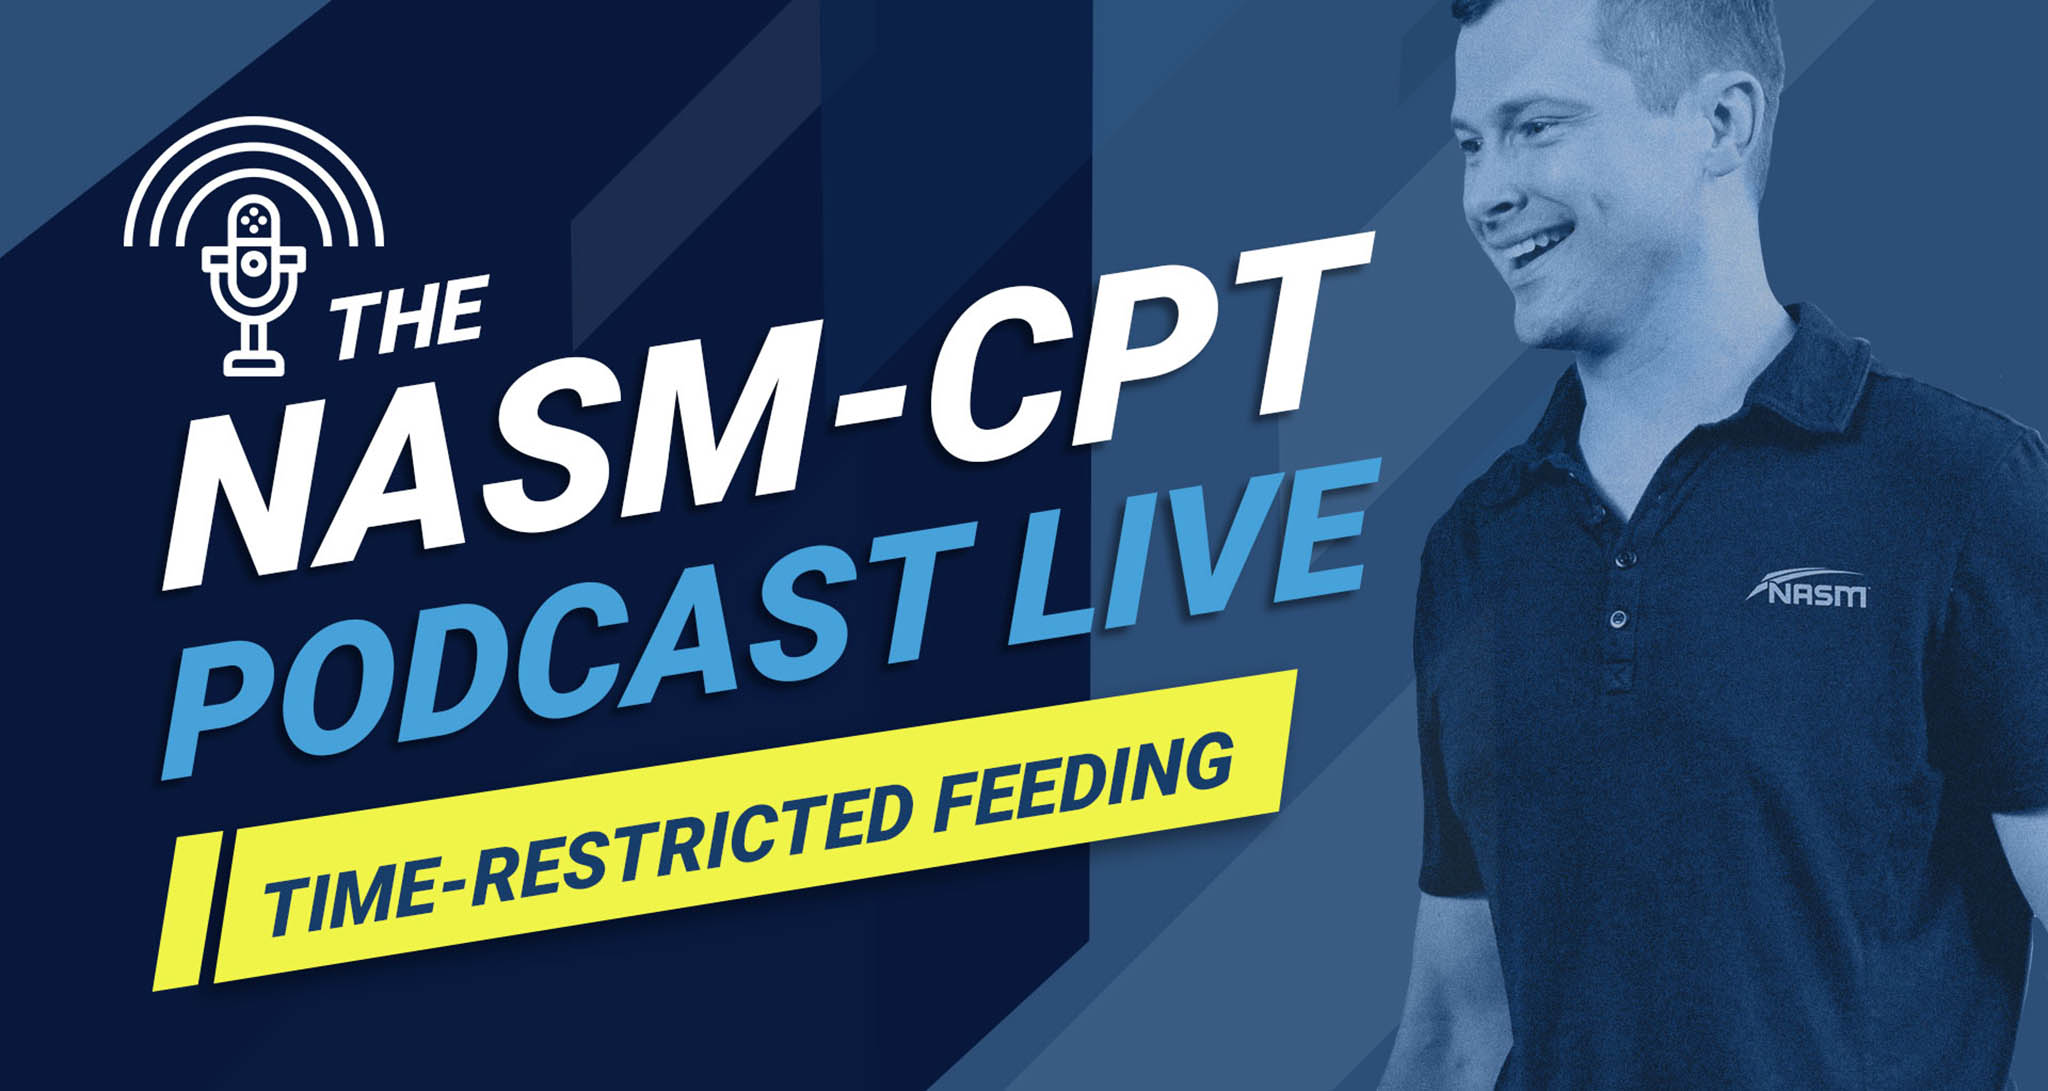 restricted feeding episode banner